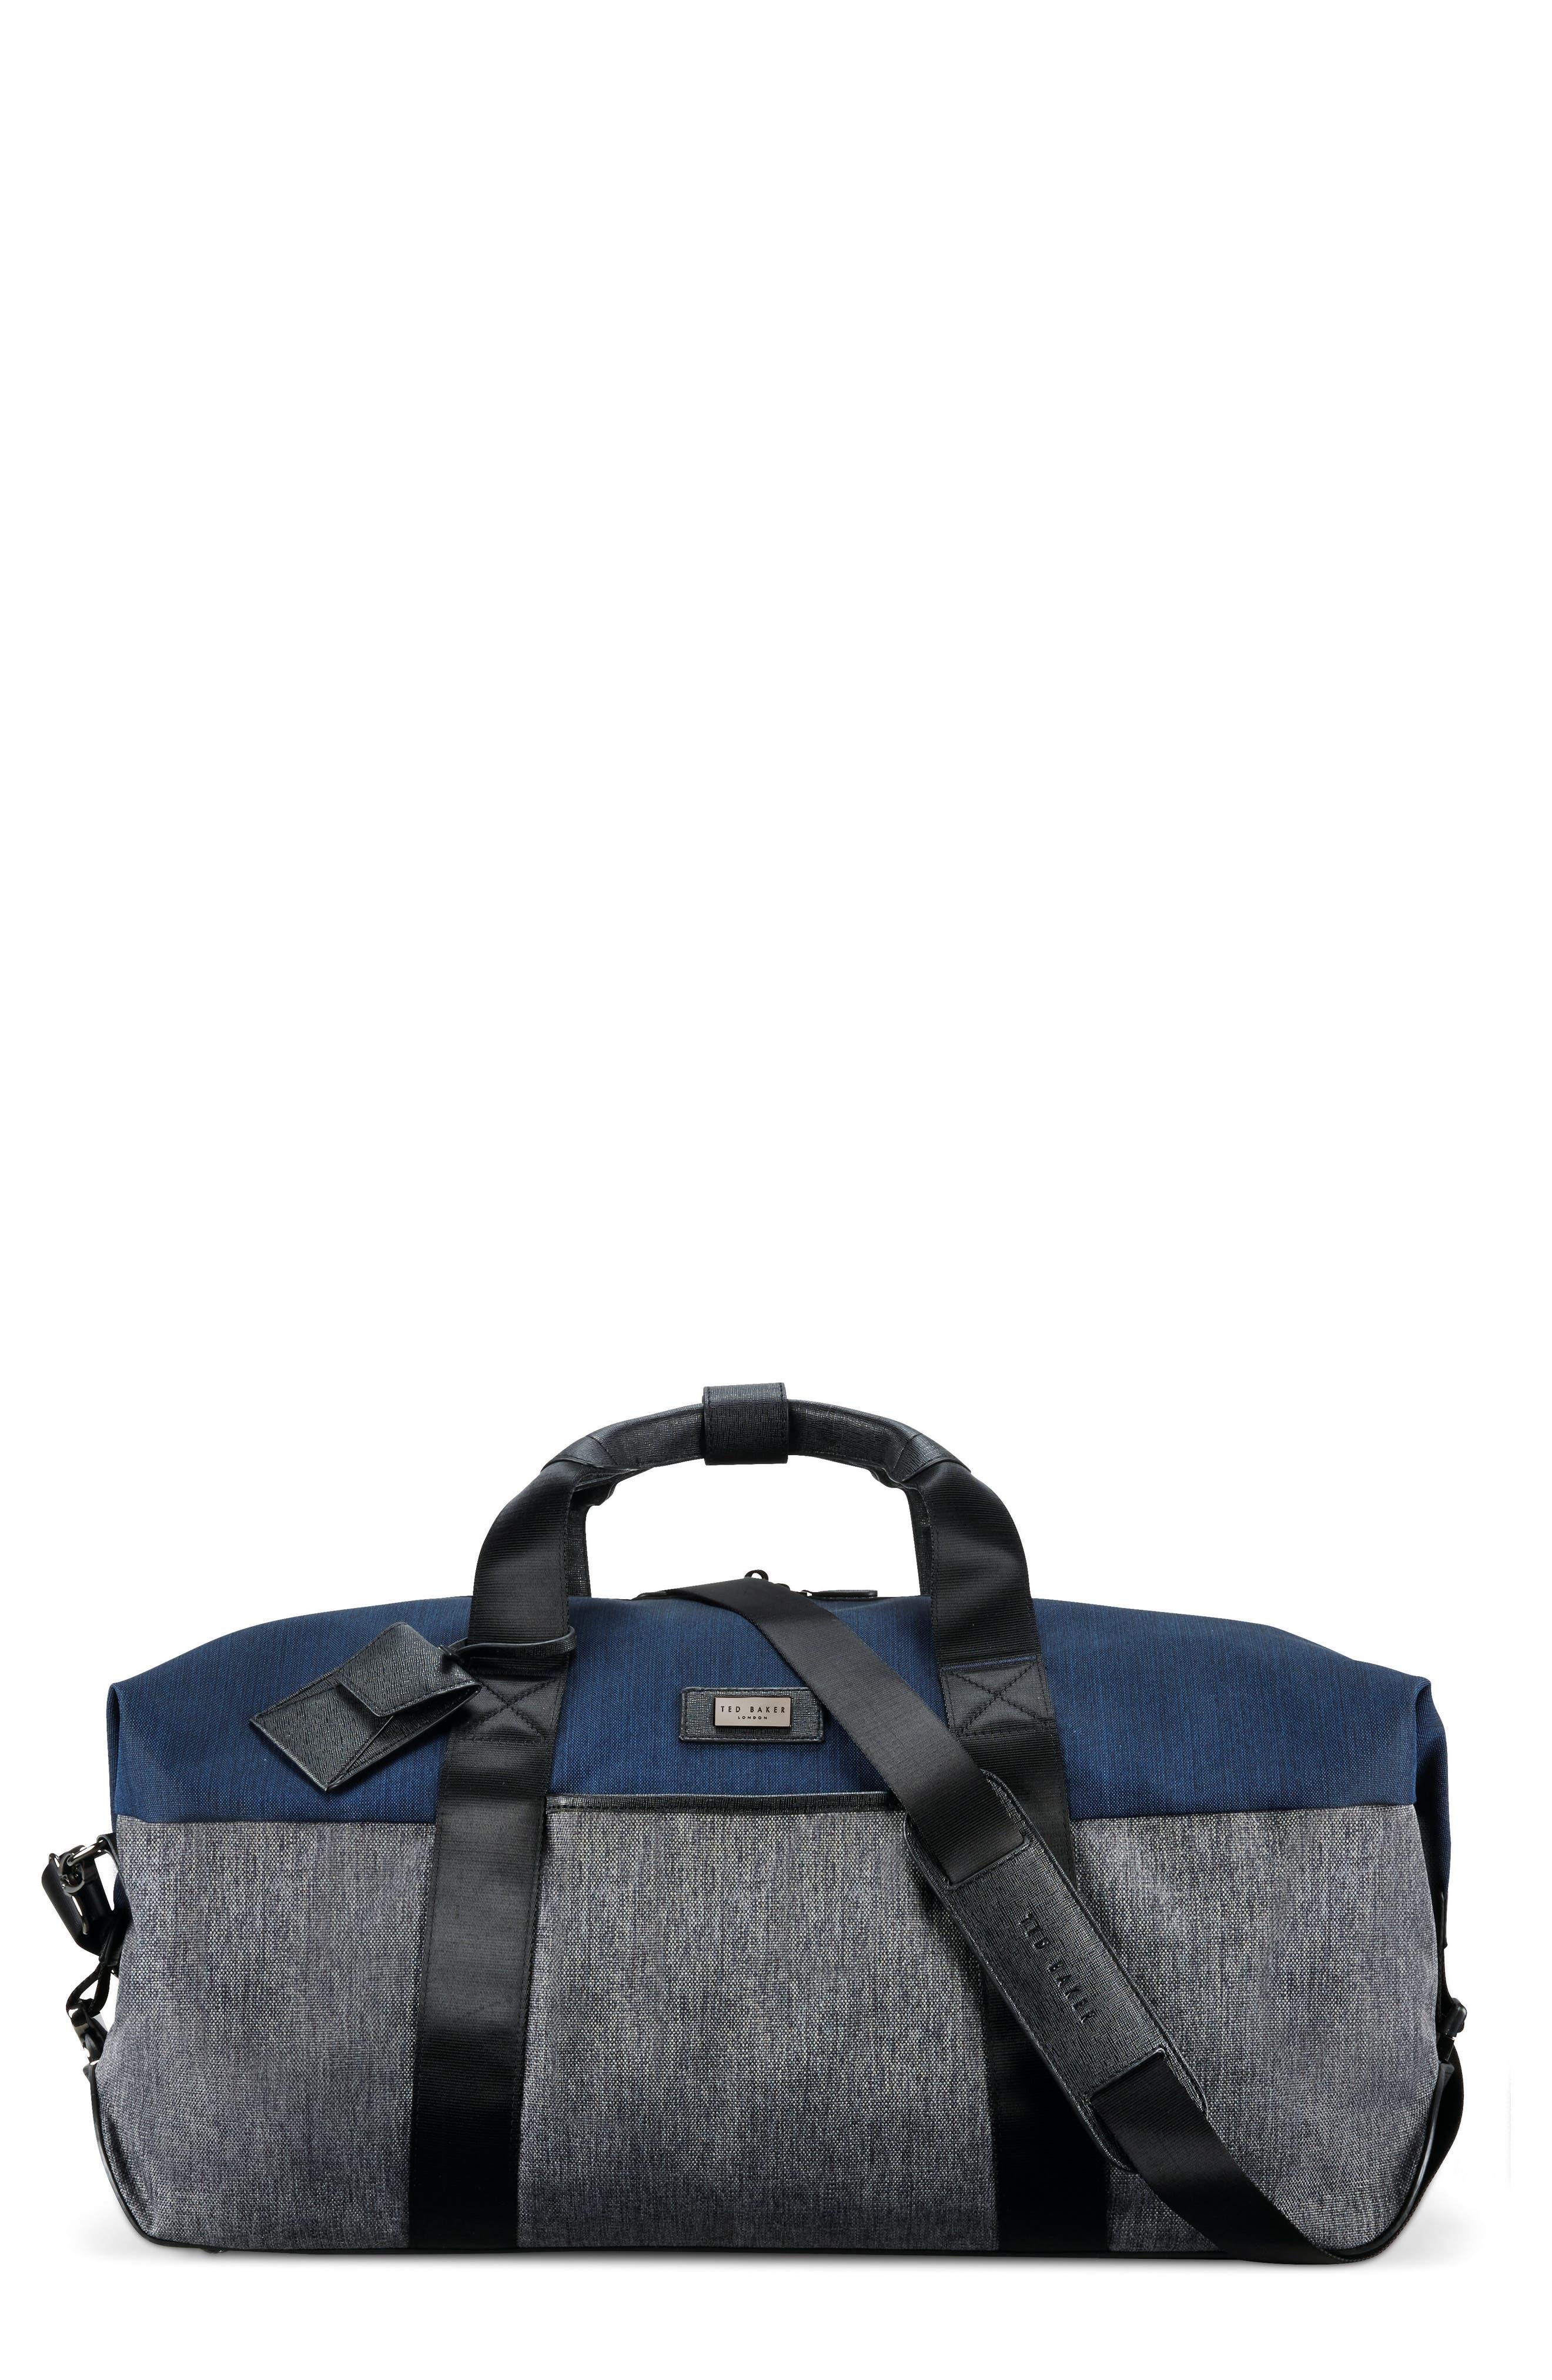 Medium Brunswick Water Resistant Duffel Bag,                             Main thumbnail 1, color,                             020